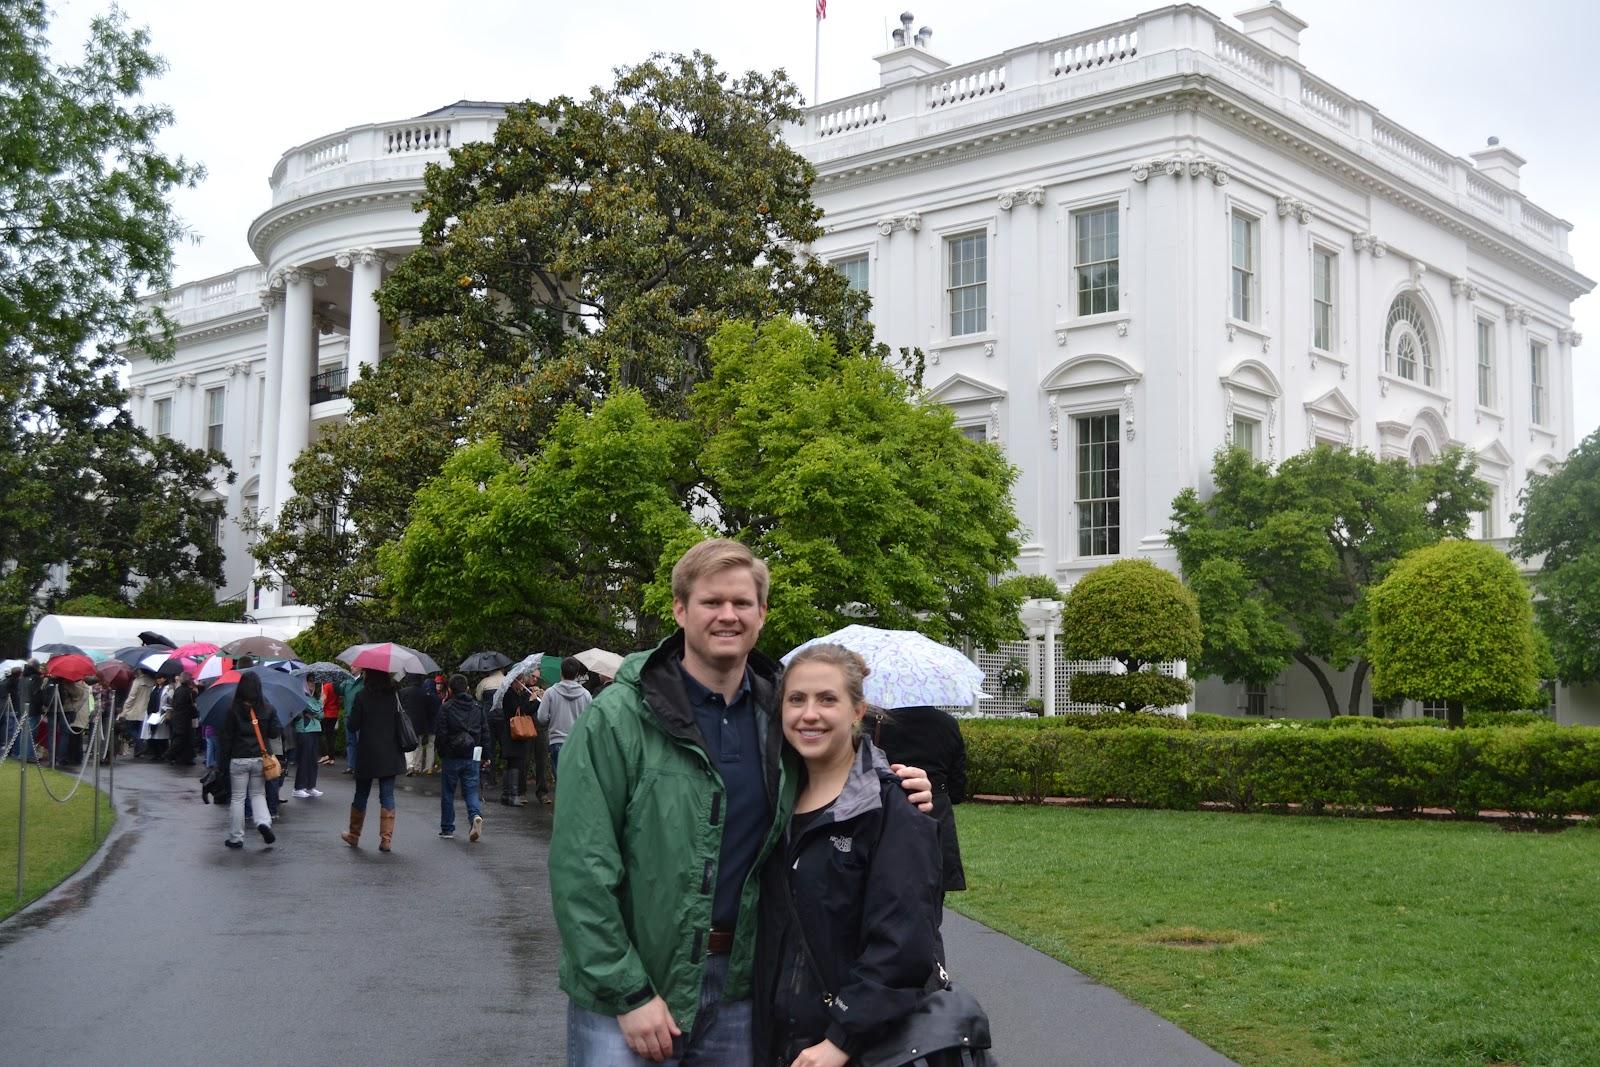 Indelible Insight: White House Spring Garden Tour